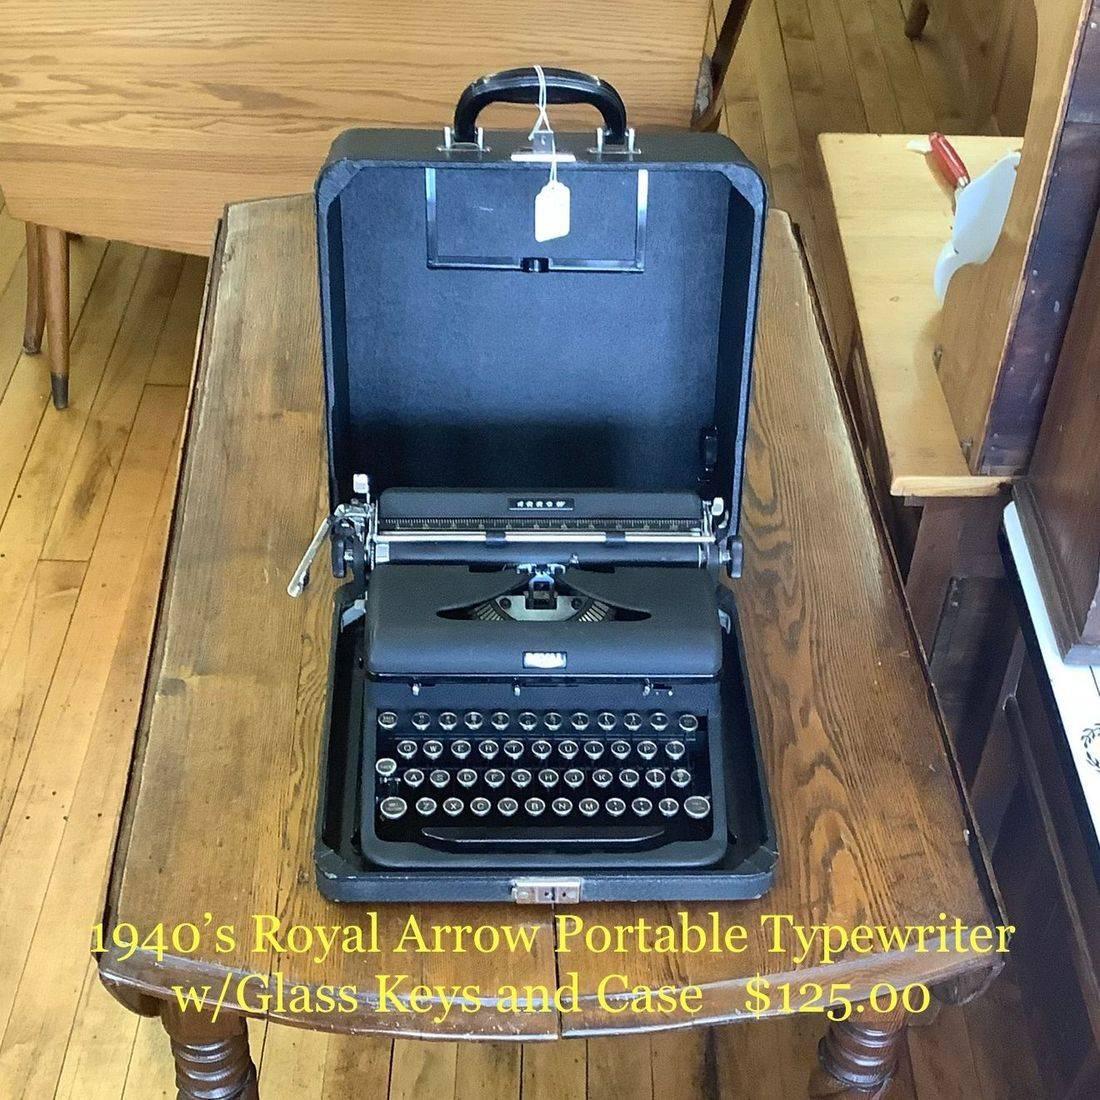 1940's Royal Arrow Portable Typewriter   $125.00